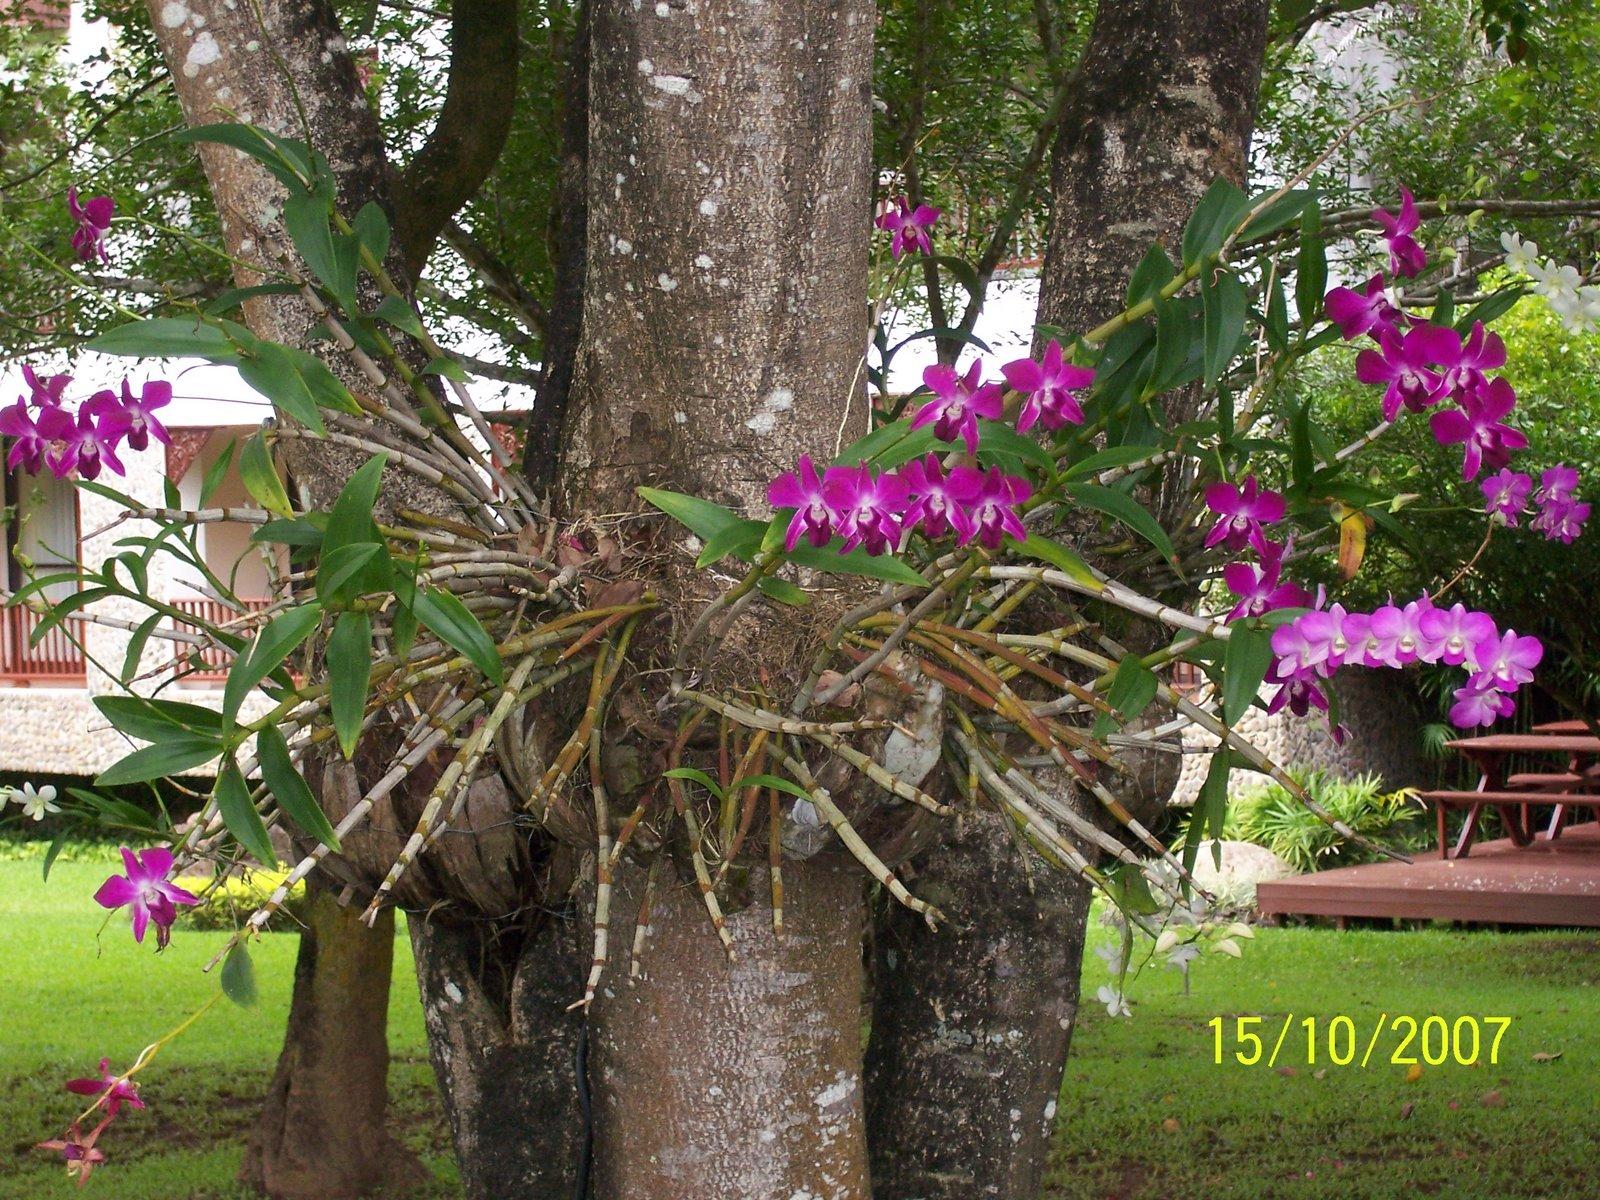 Decora j a beleza das orqu deas for Cuidado de las orquideas moradas